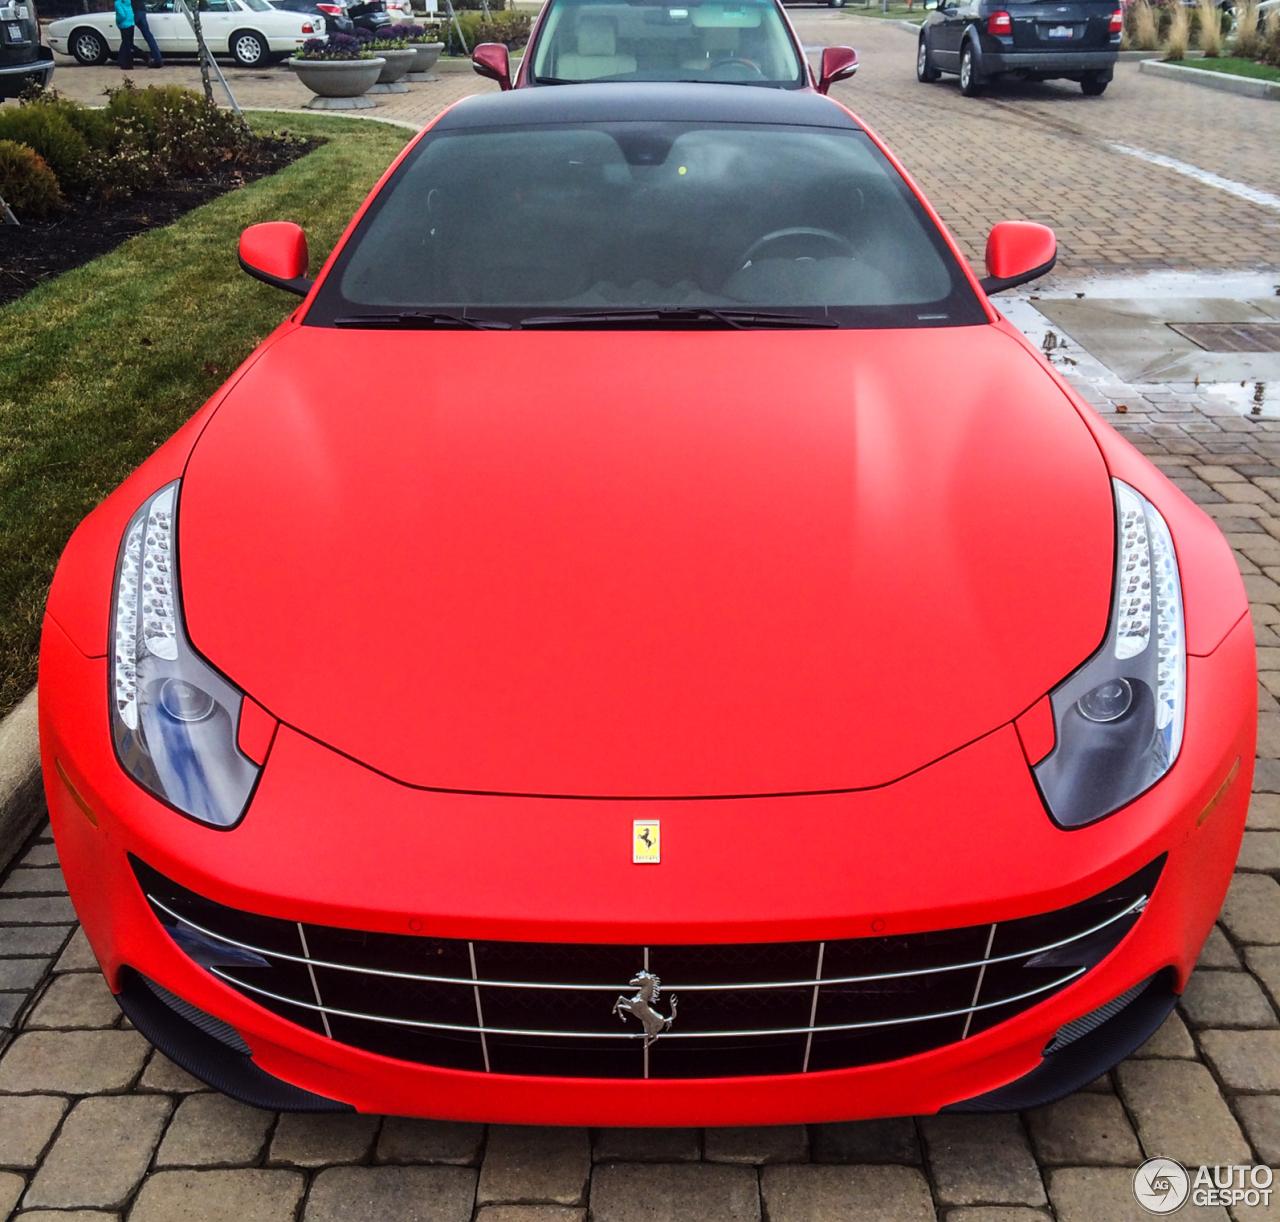 Ferrari Ff: 8 December 2014